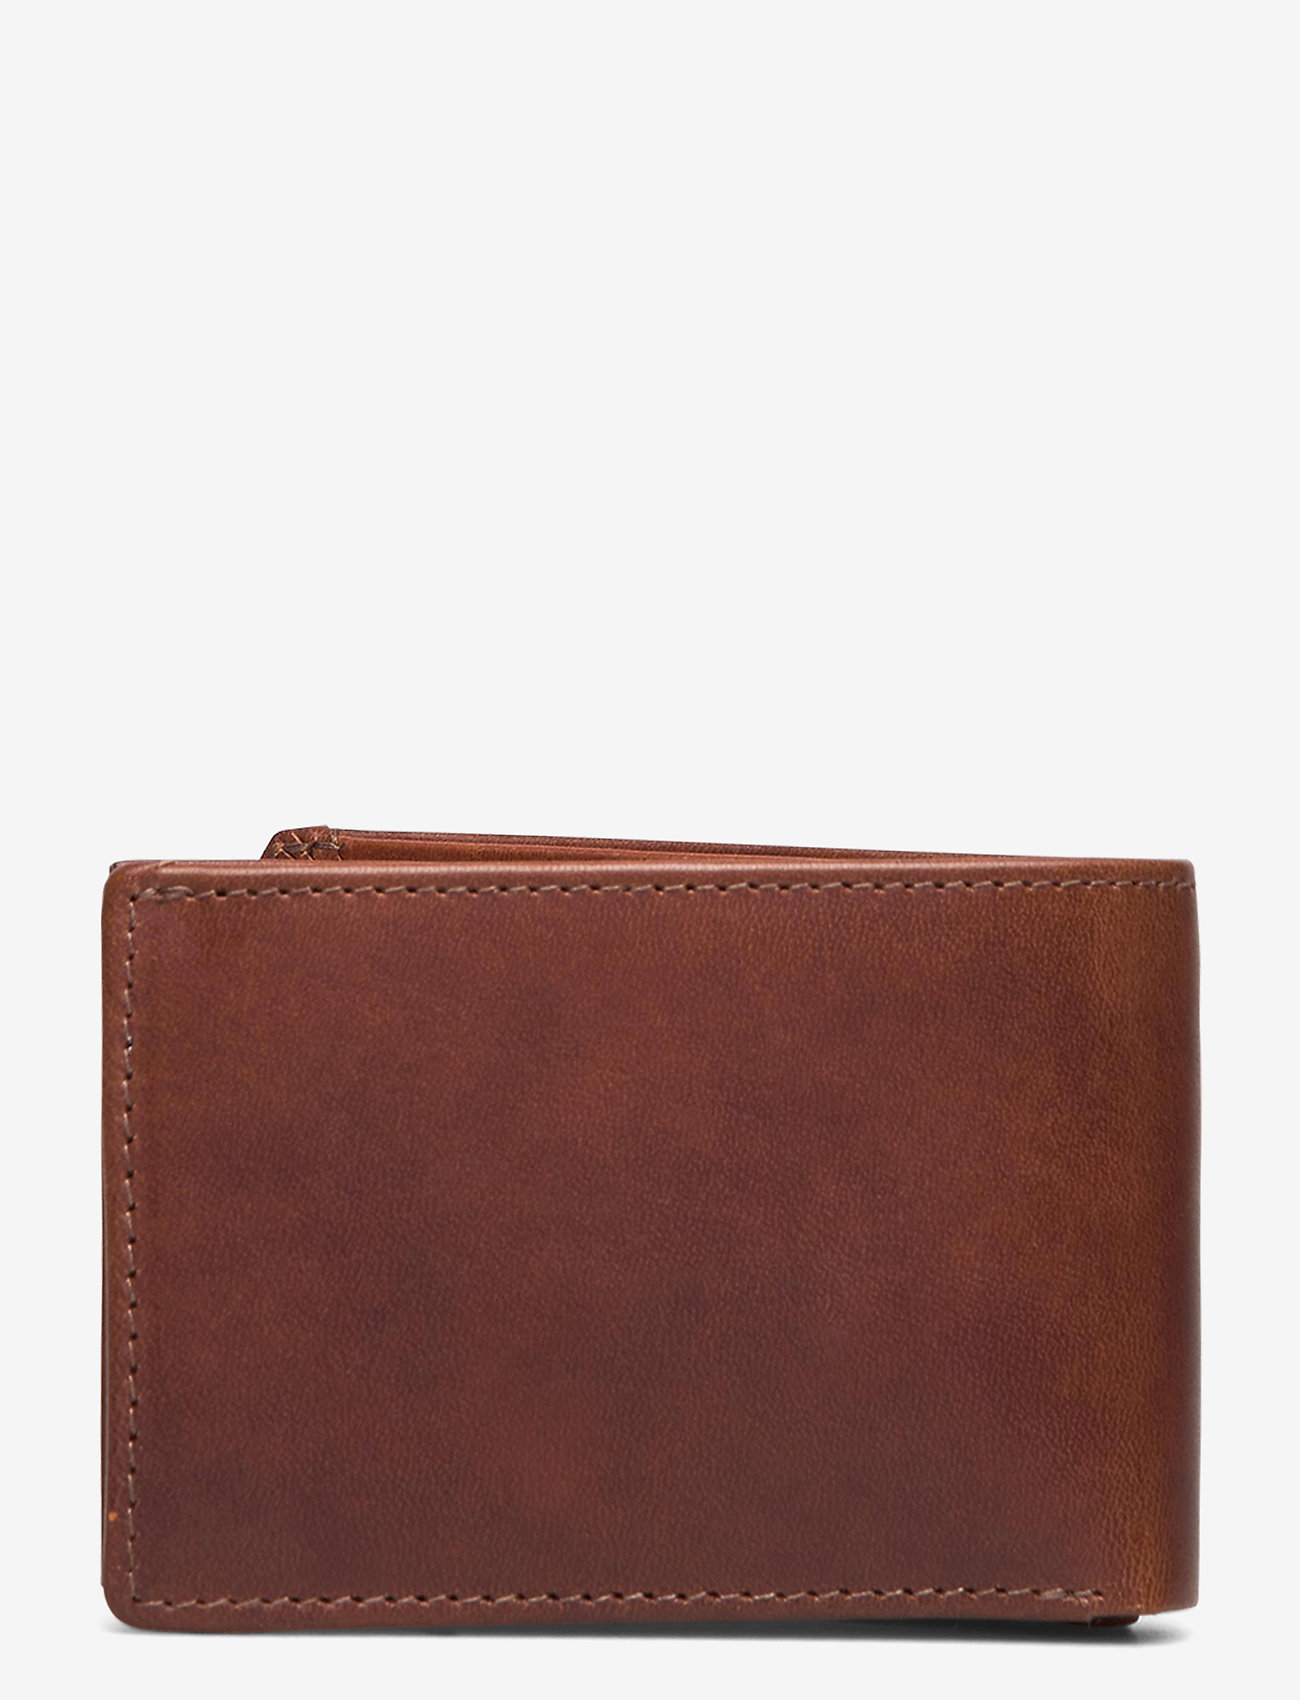 SDLR - Rybakken - classic wallet - brown - 1